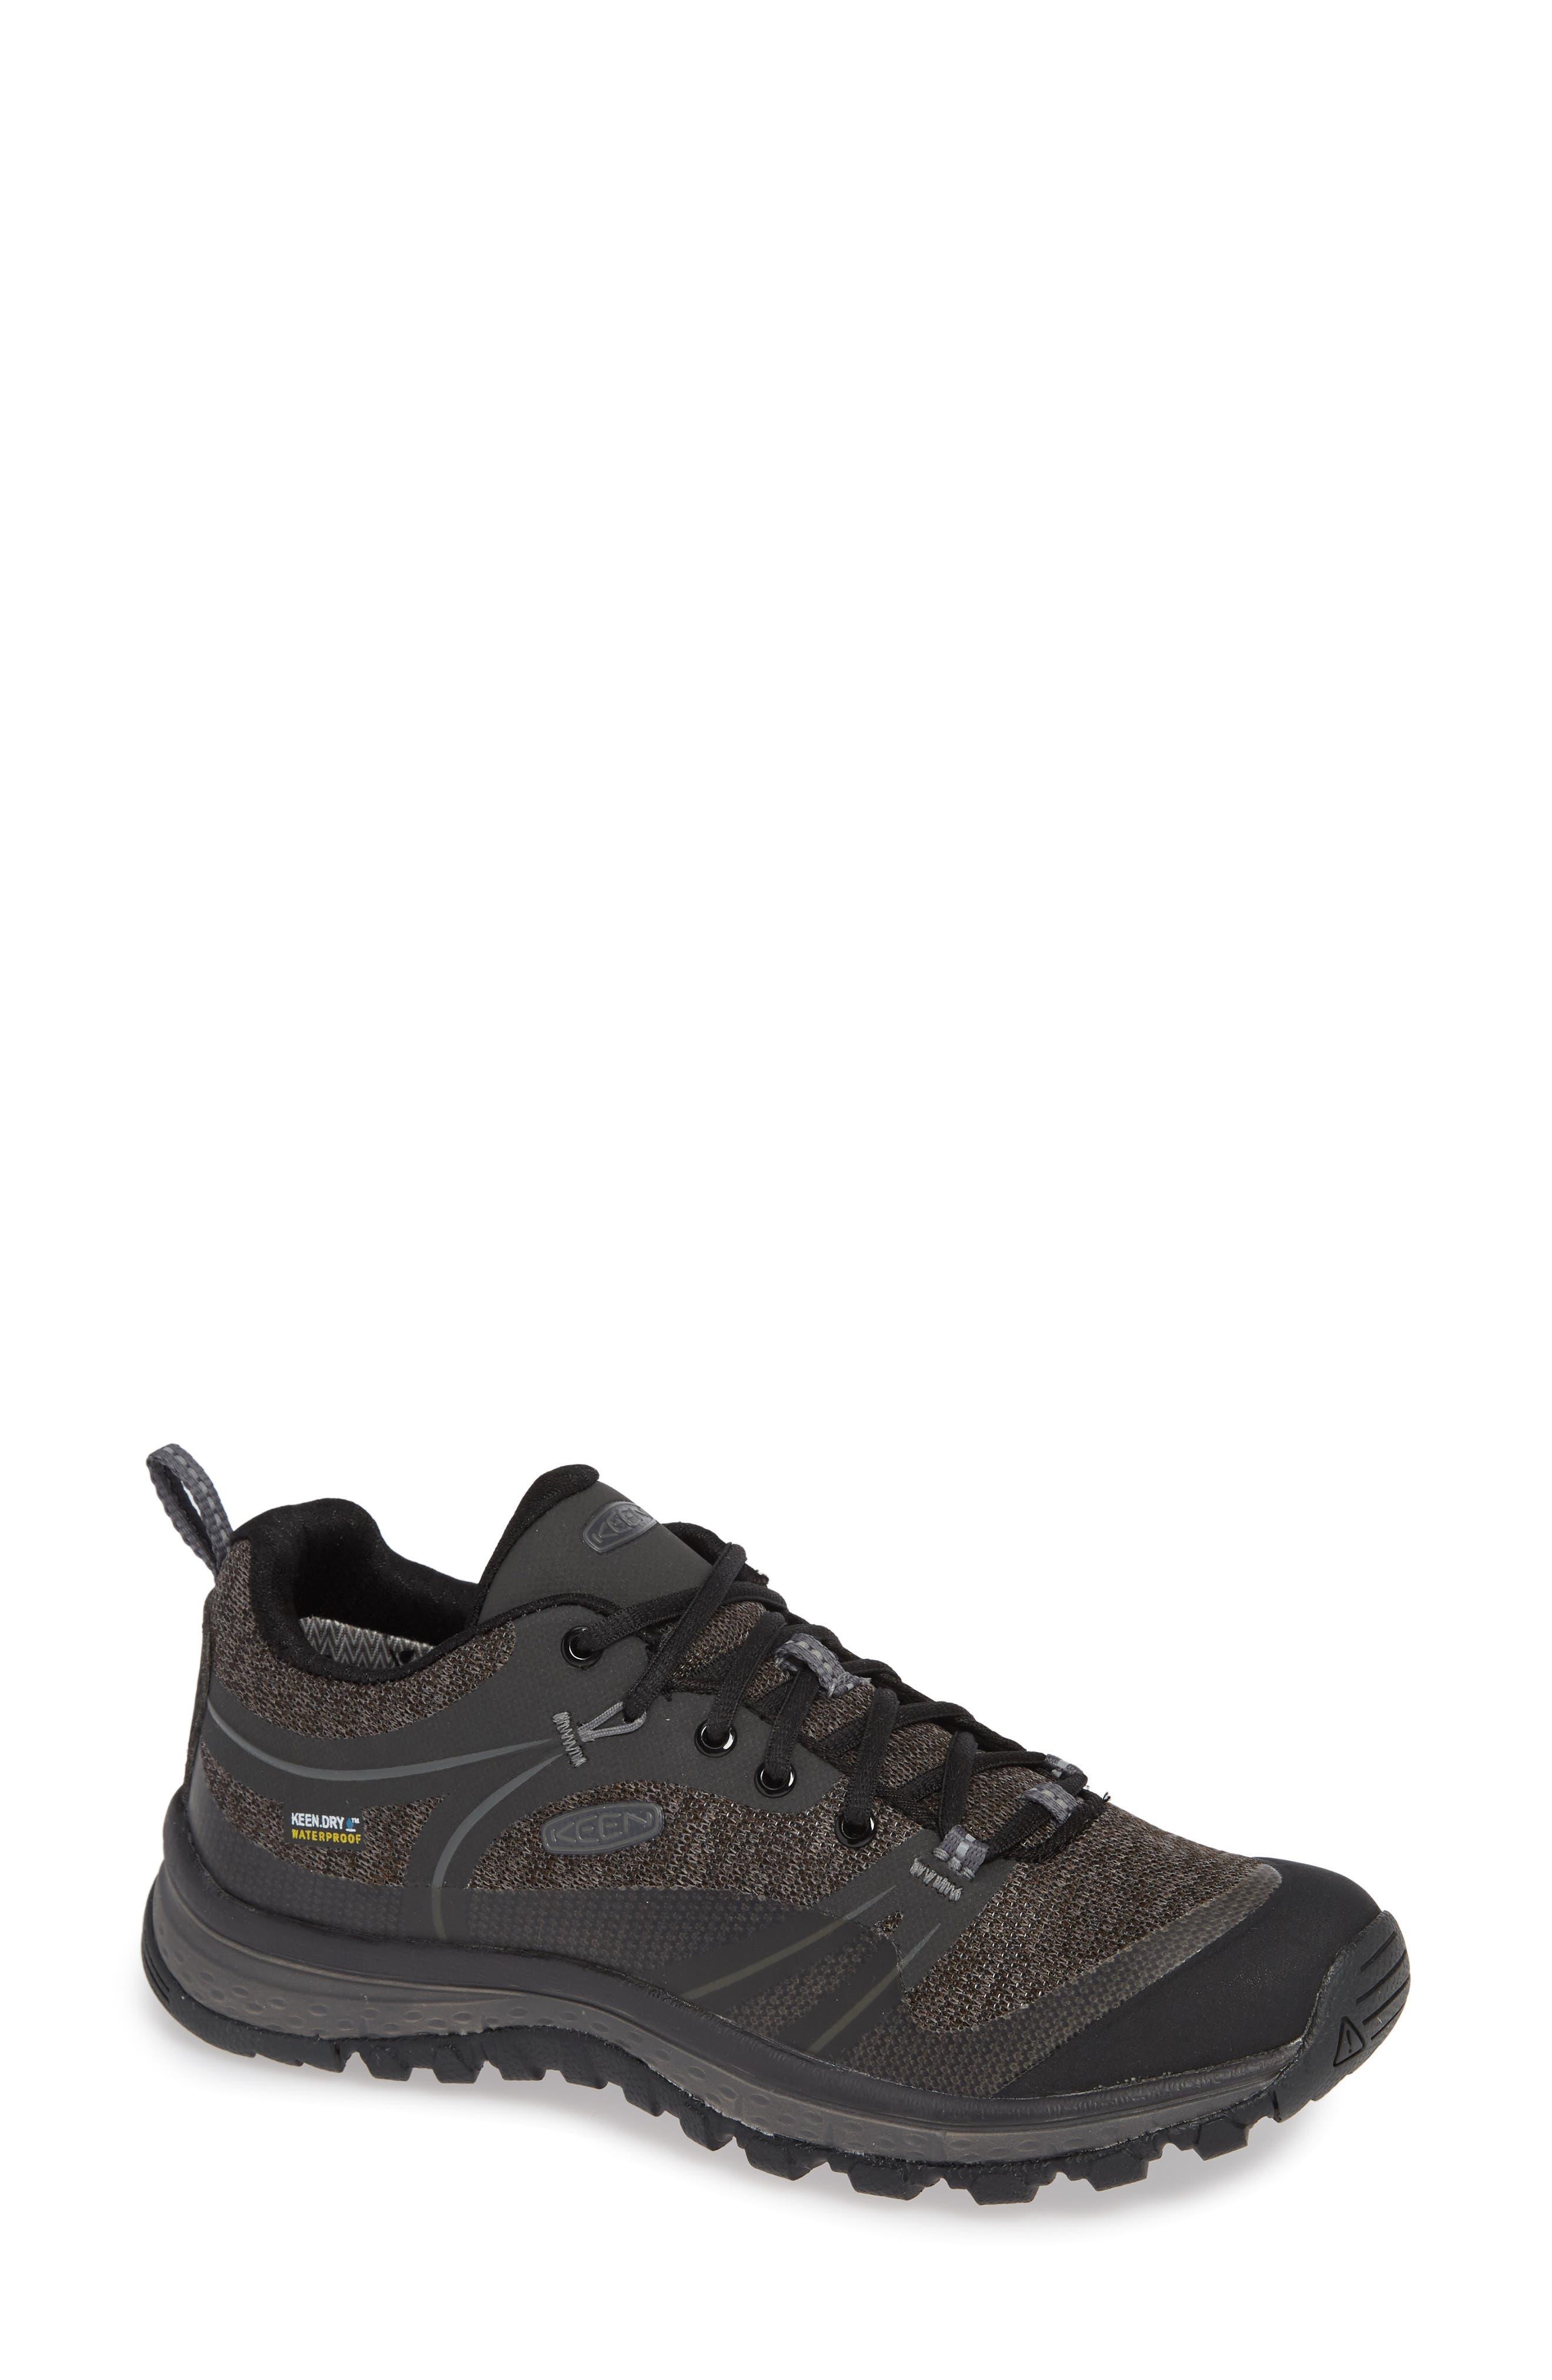 KEEN Terradora Hiking Waterproof Sneaker, Main, color, RAVEN/ GARGOYLE